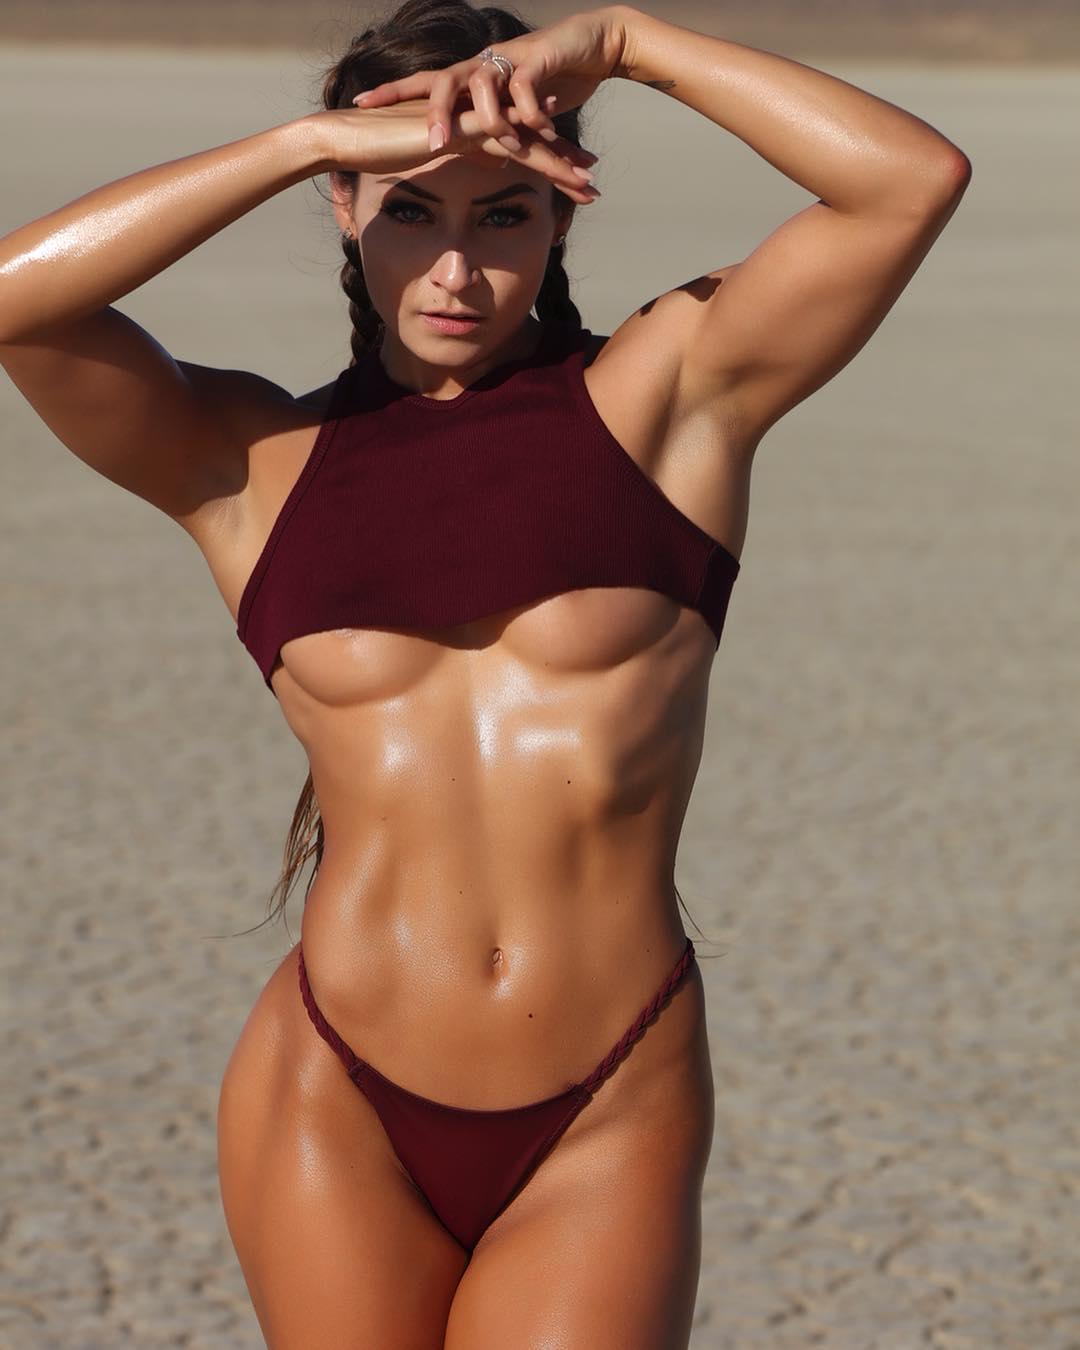 Naked bikini fitness models